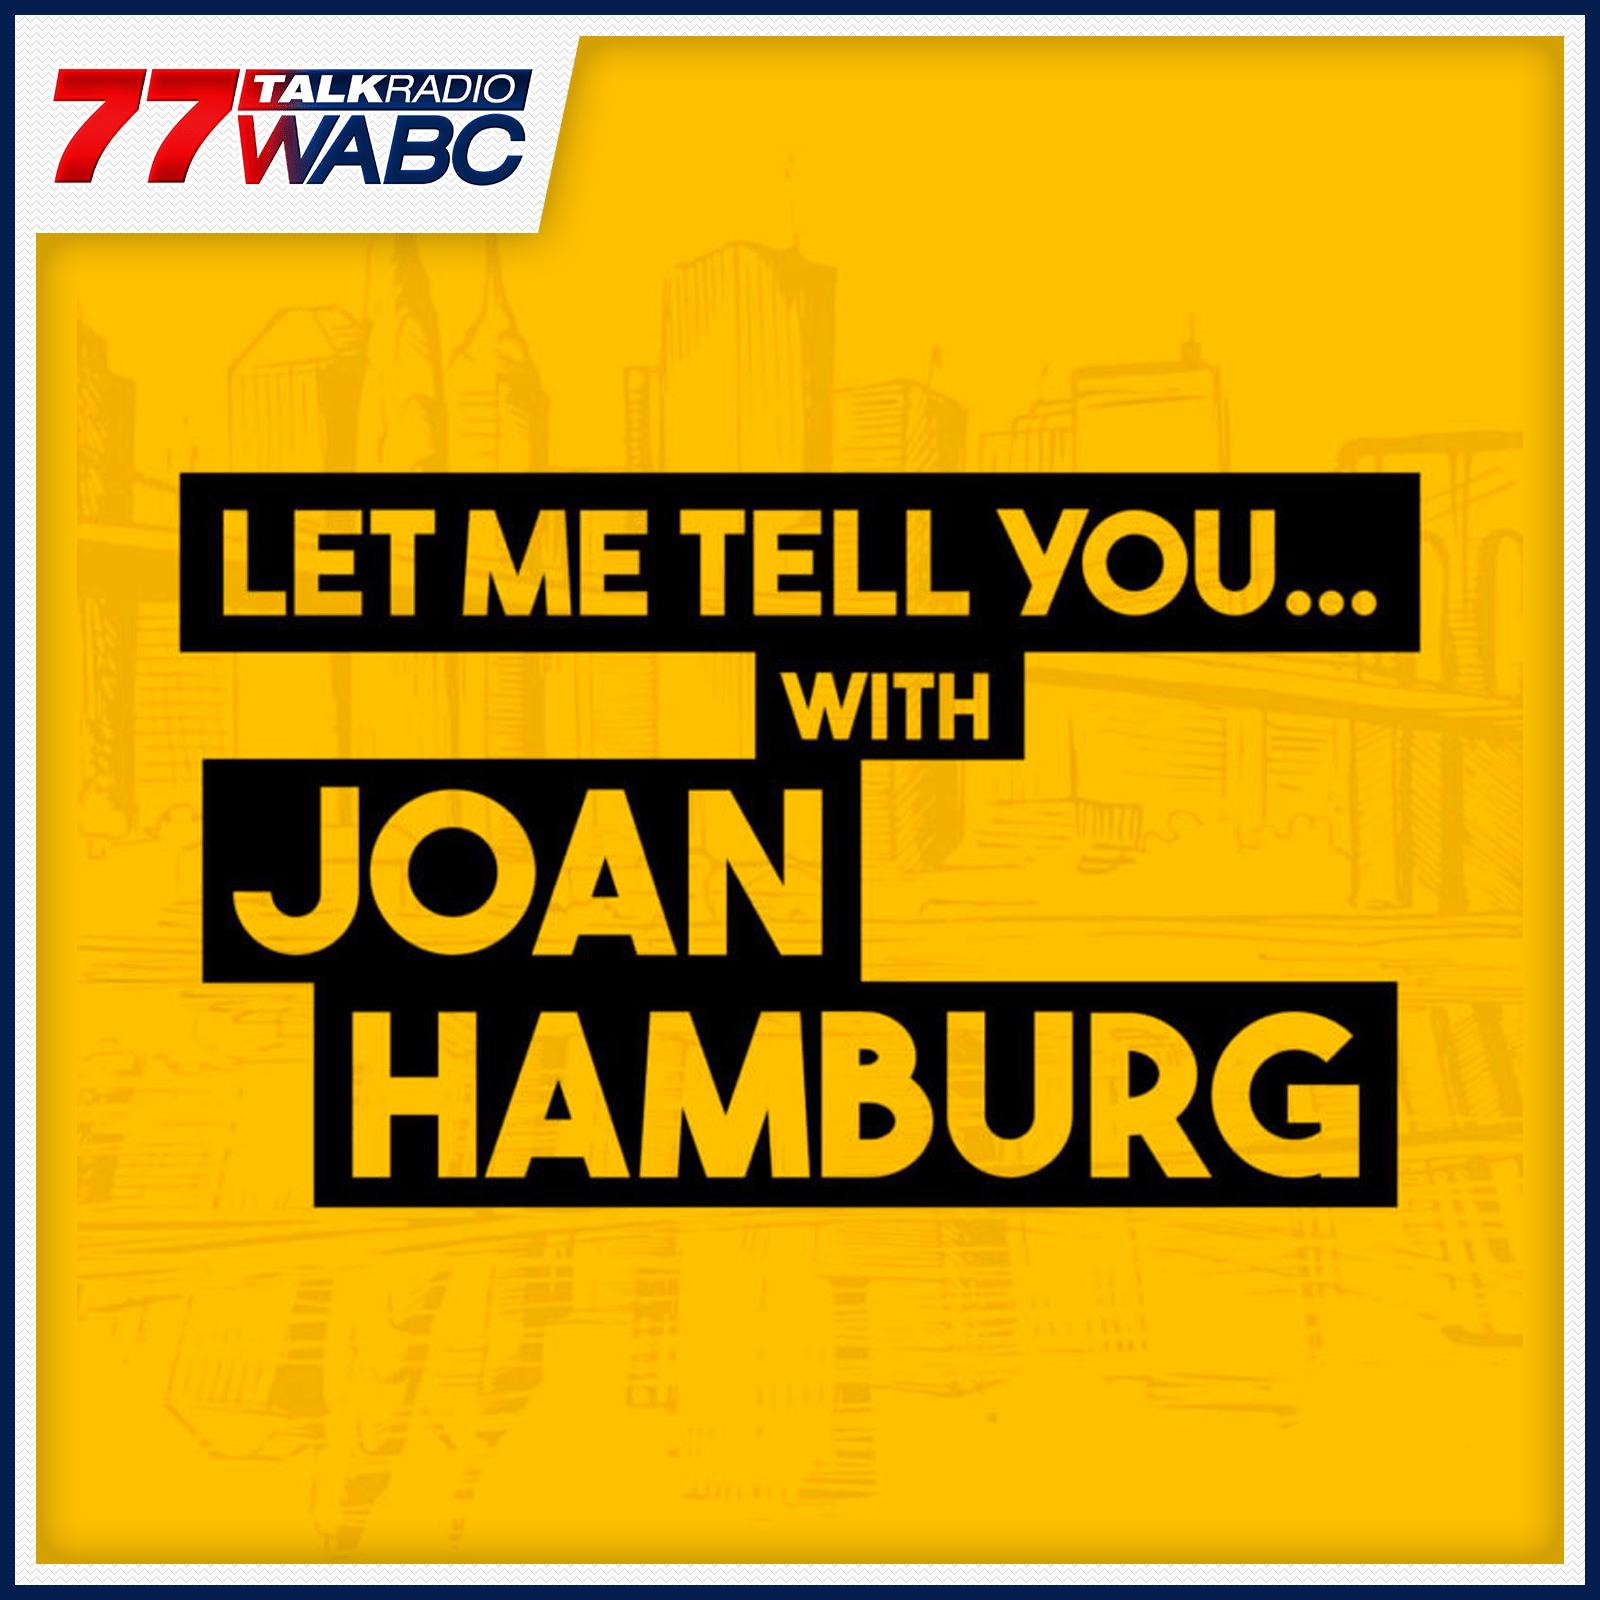 Joan-Hamburg-let-me-tell-you-Podcast